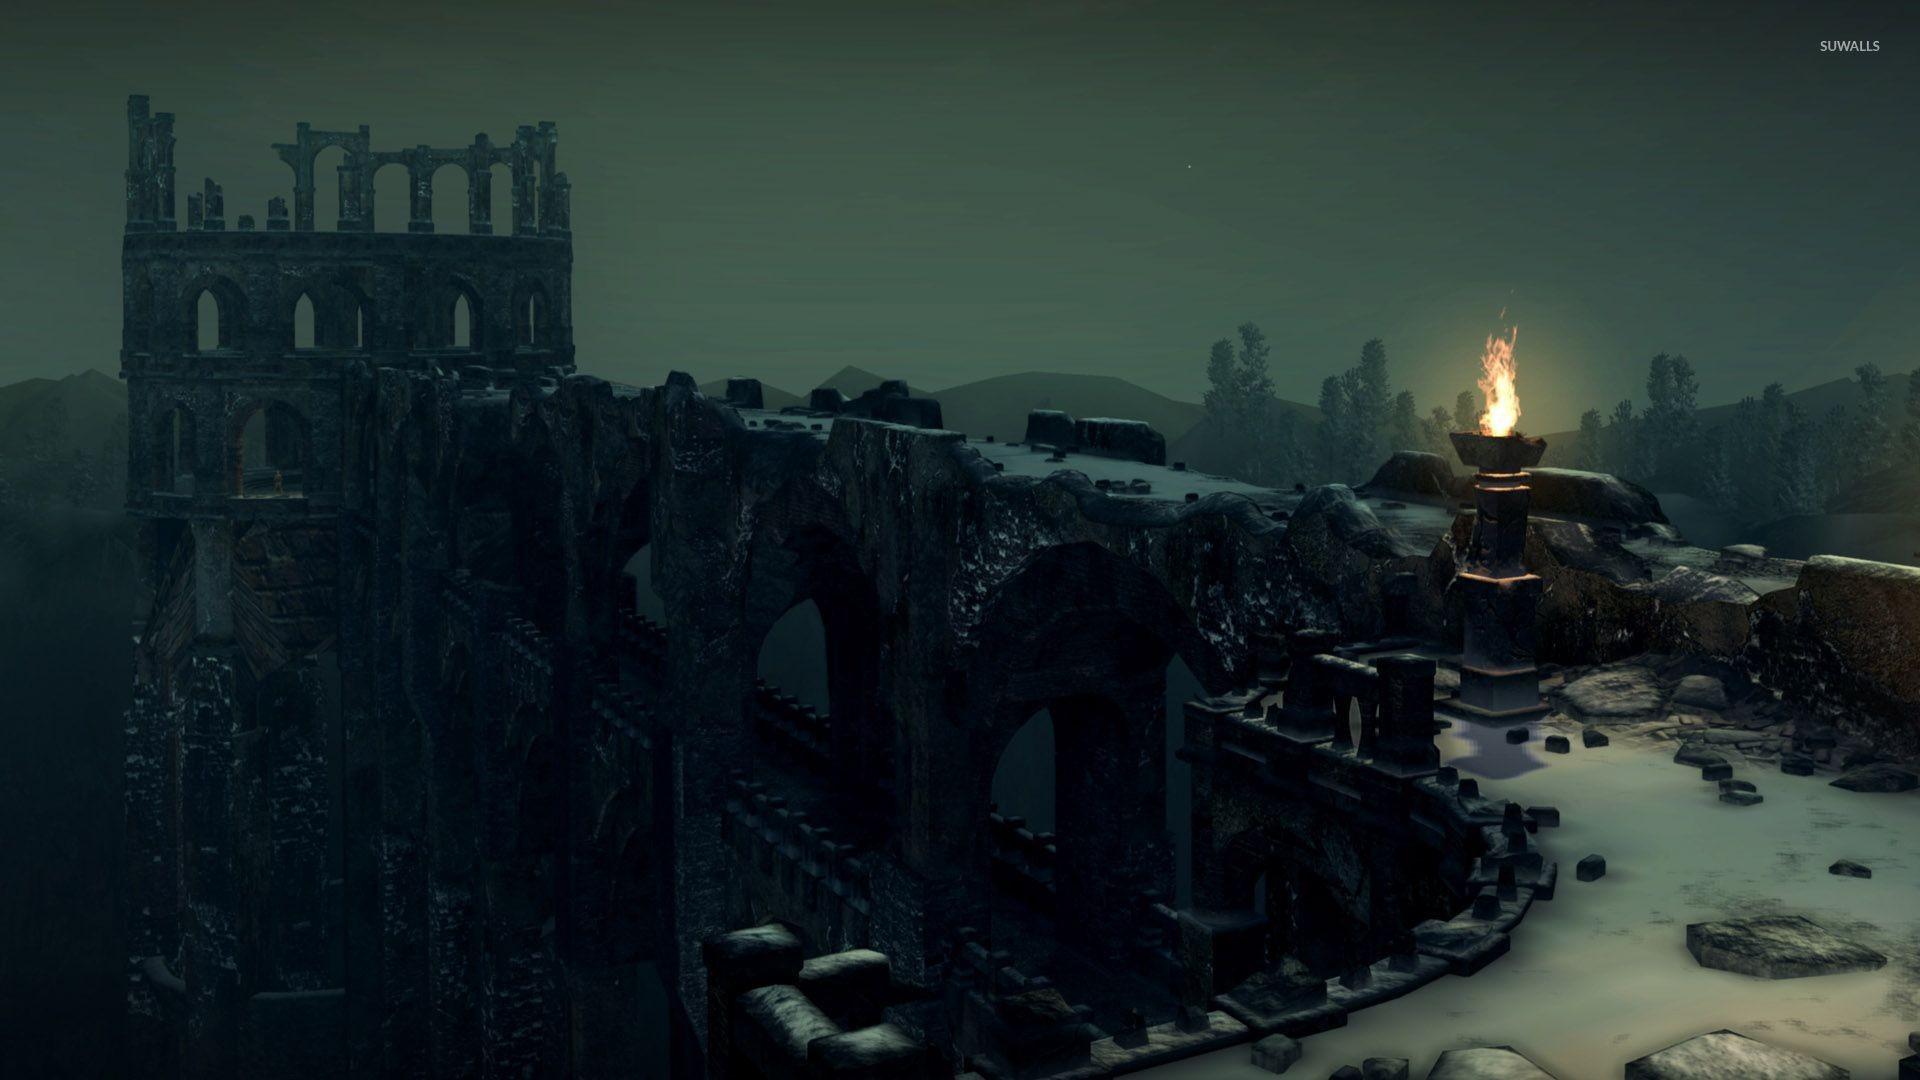 Dark Souls 3 – – Full HD 16/9 – Wallpaper #7347 on